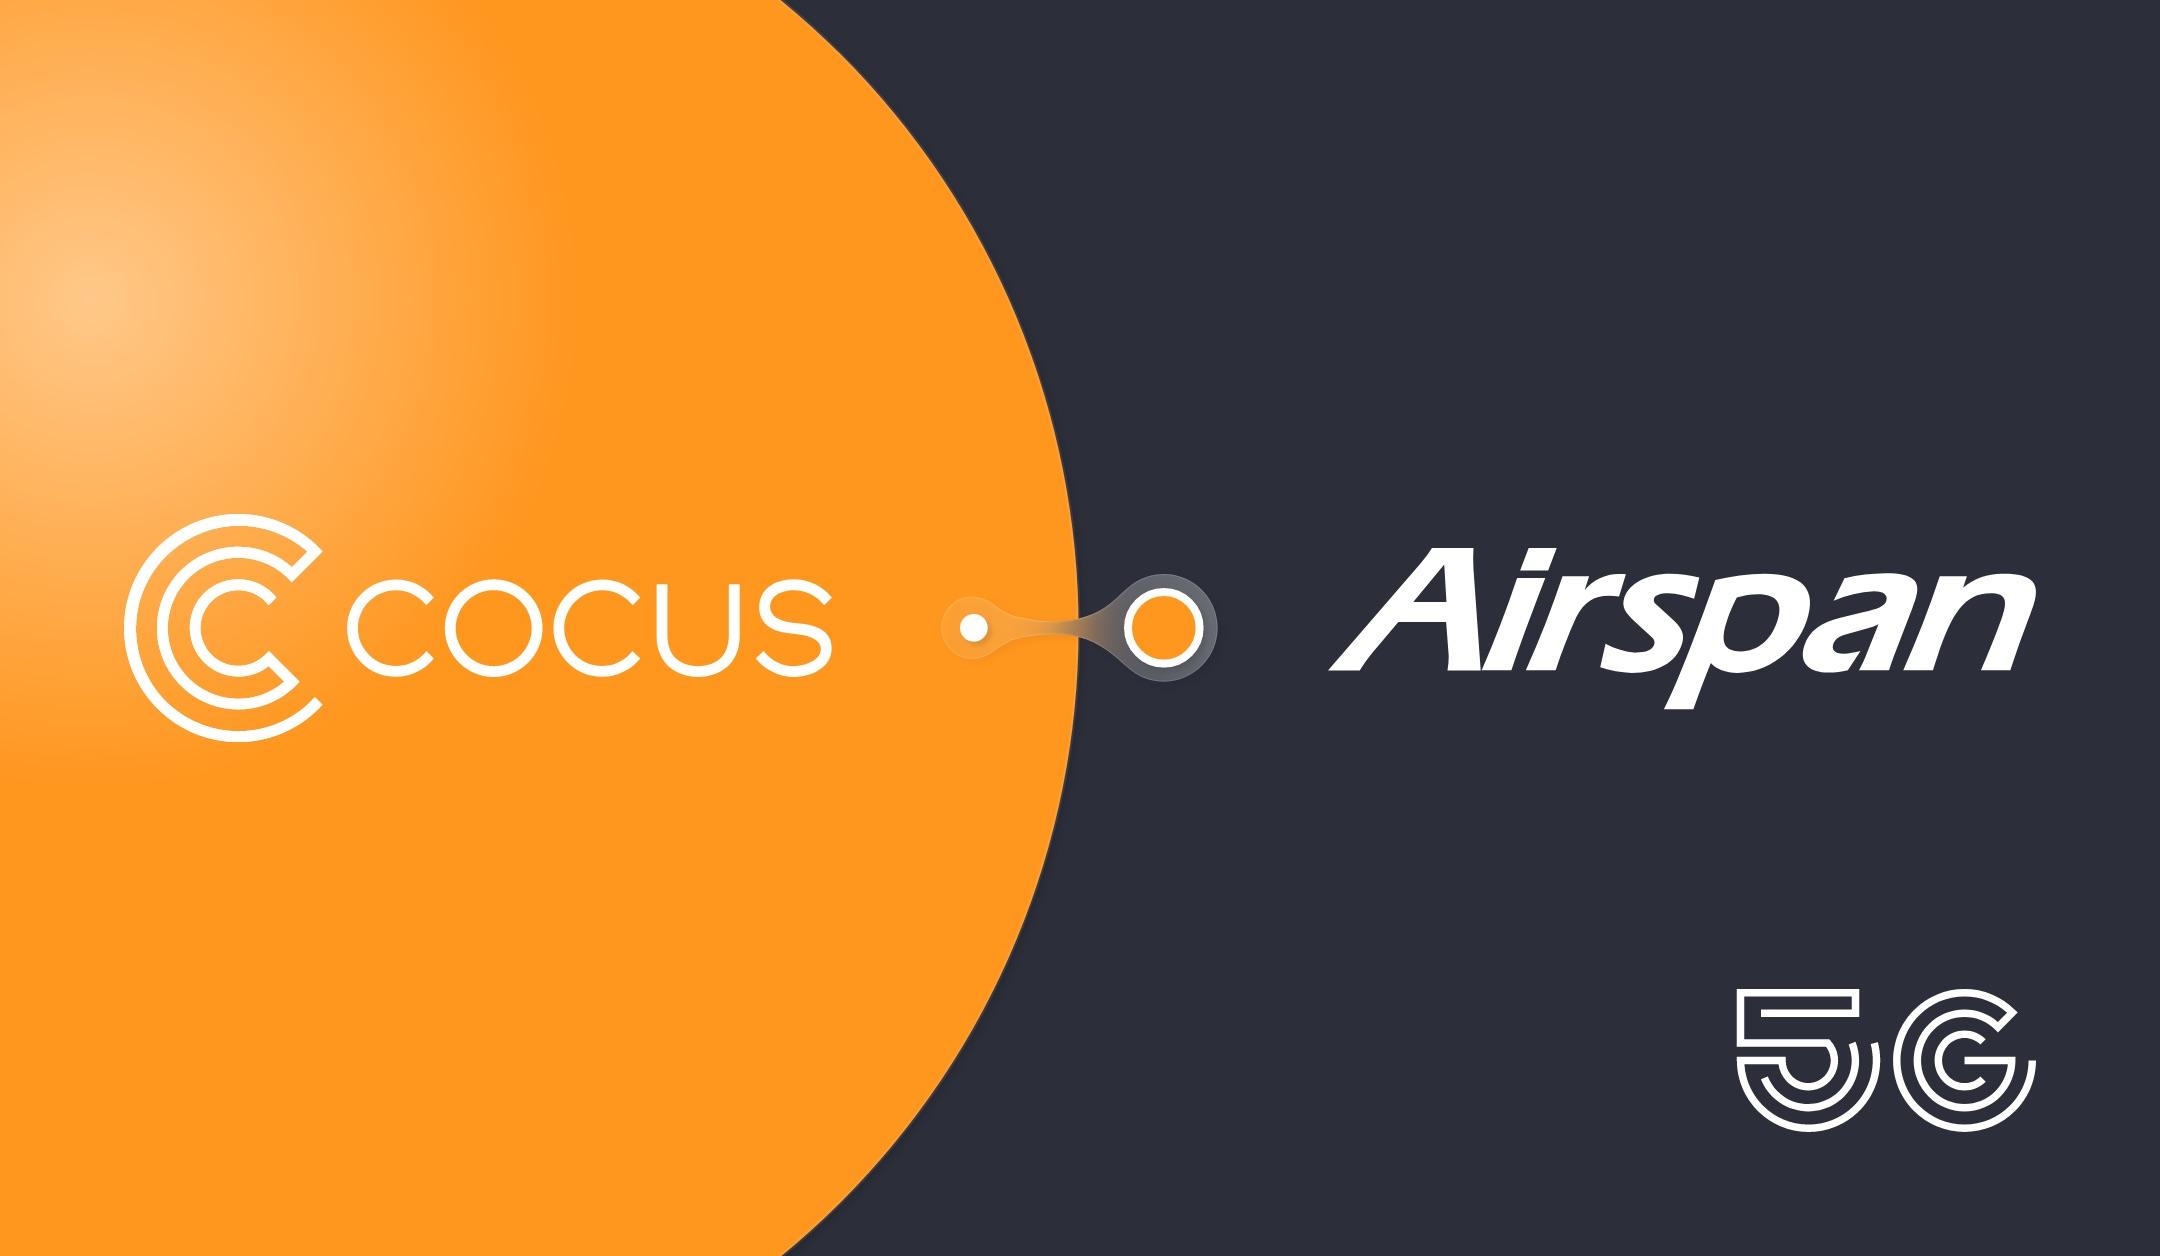 Cocus wählt Airspan